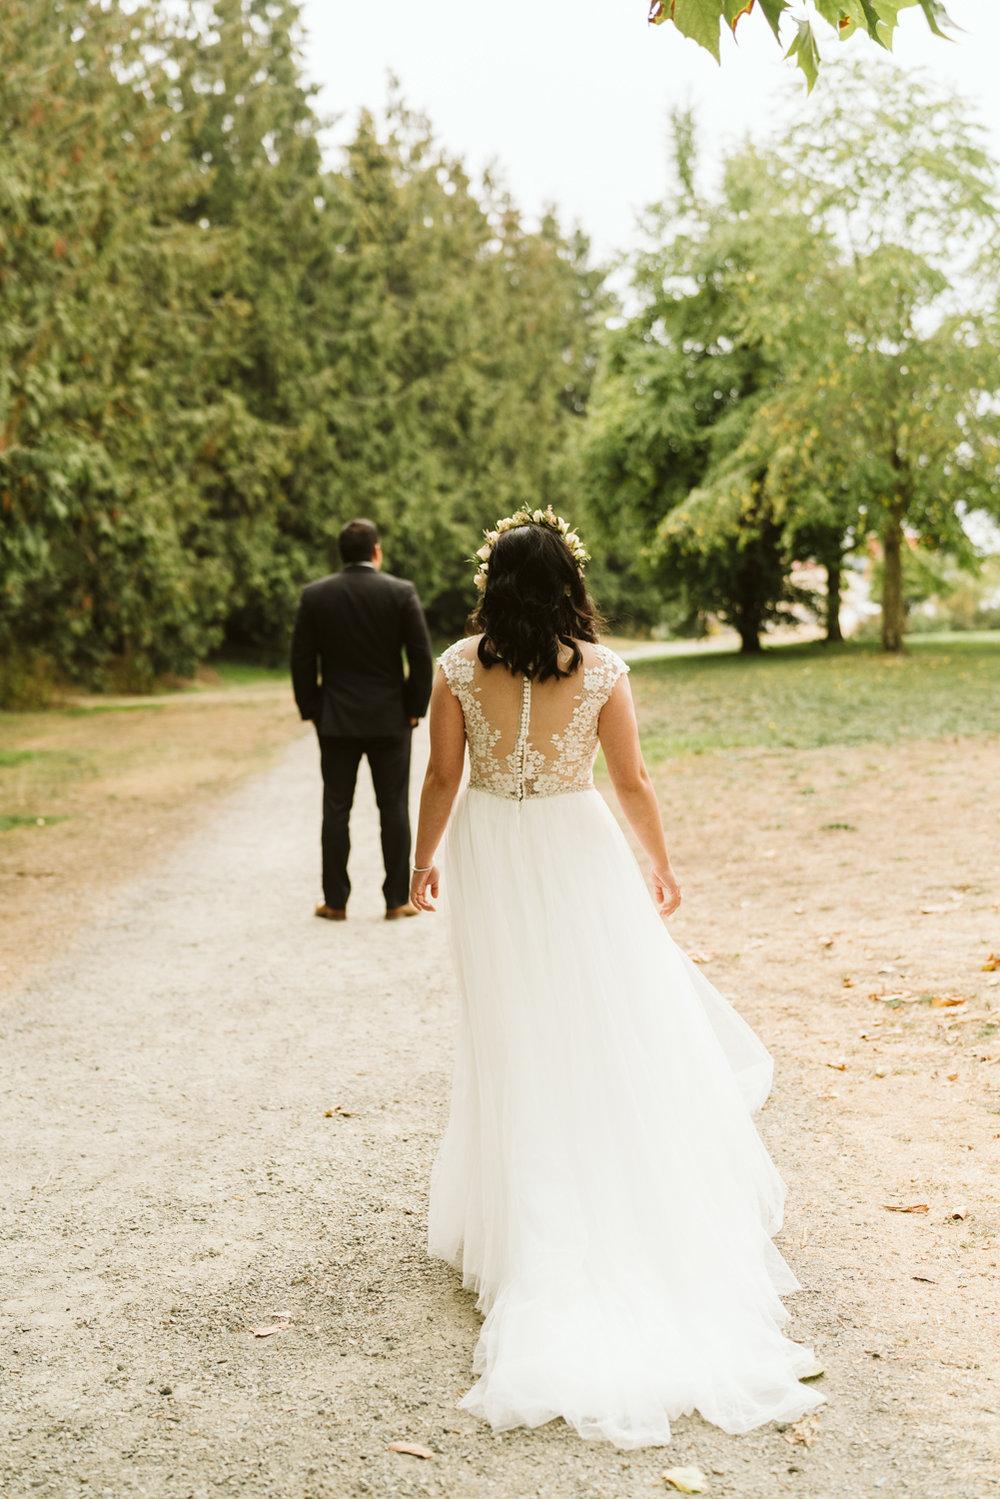 April Yentas Photography - Nina & Chris slideshow-2.jpg